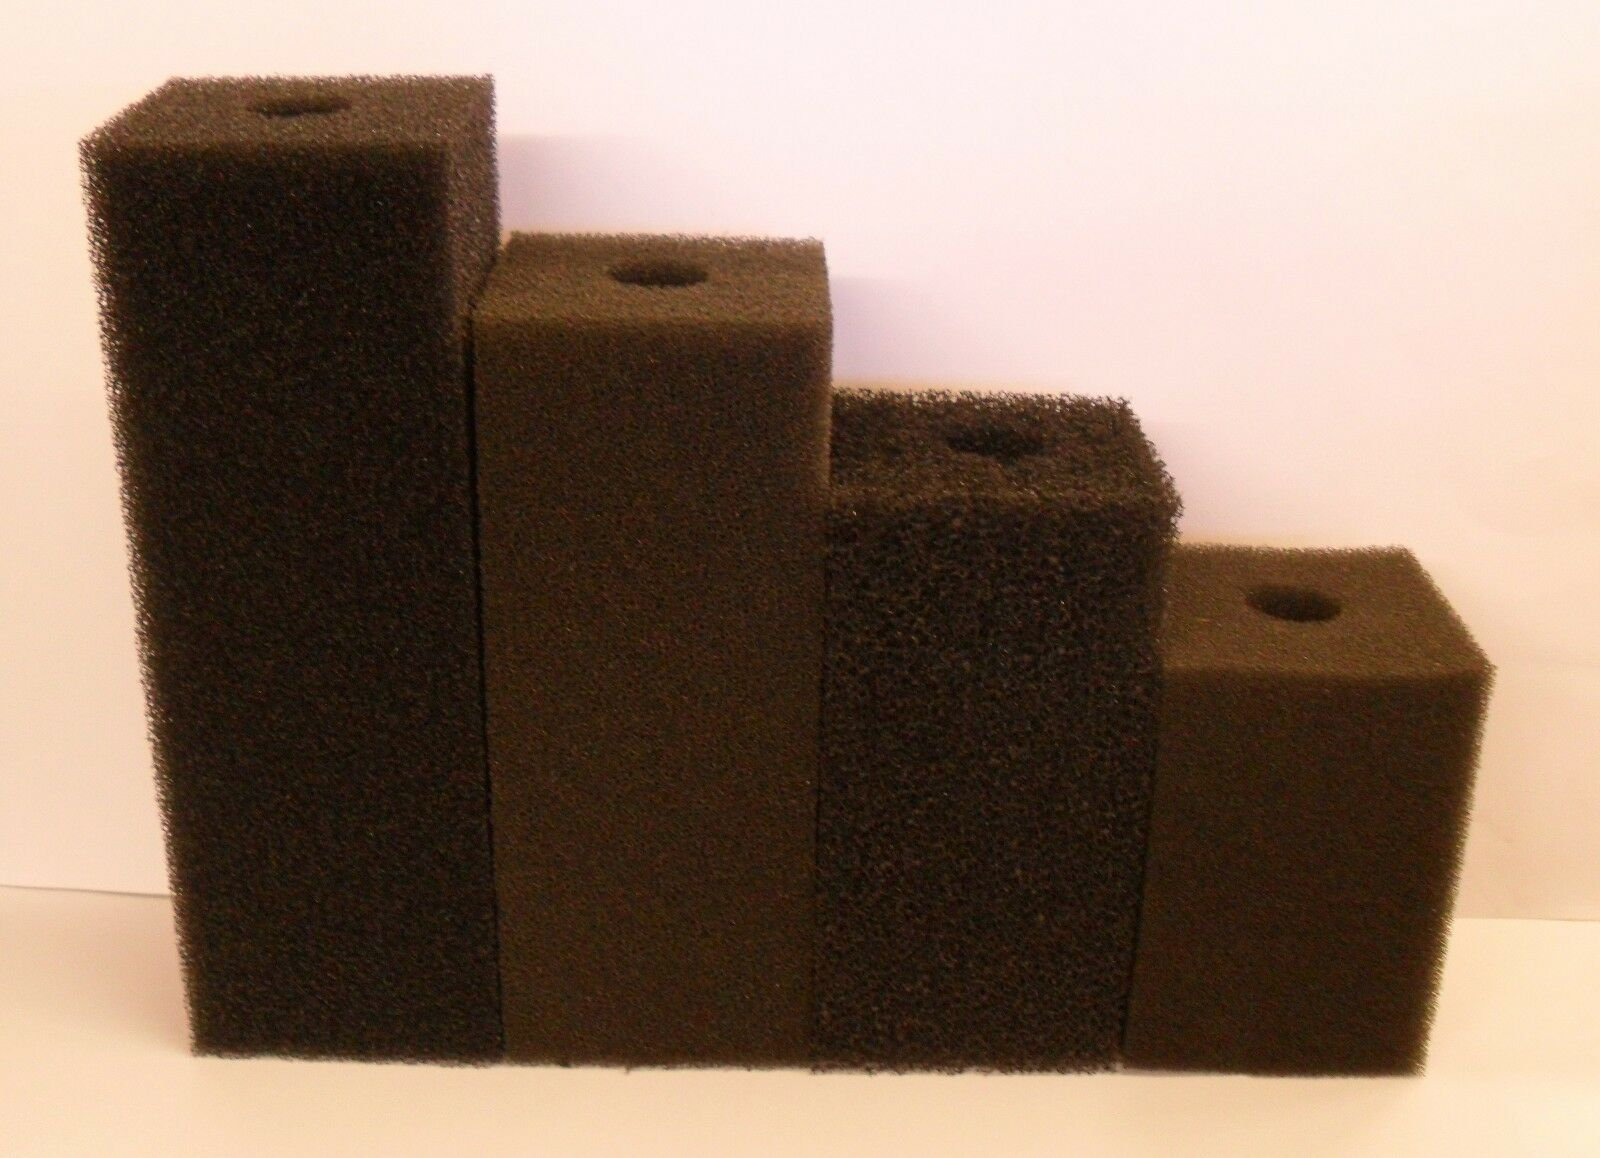 COARSE FILTER FOAM BLOCKS 6